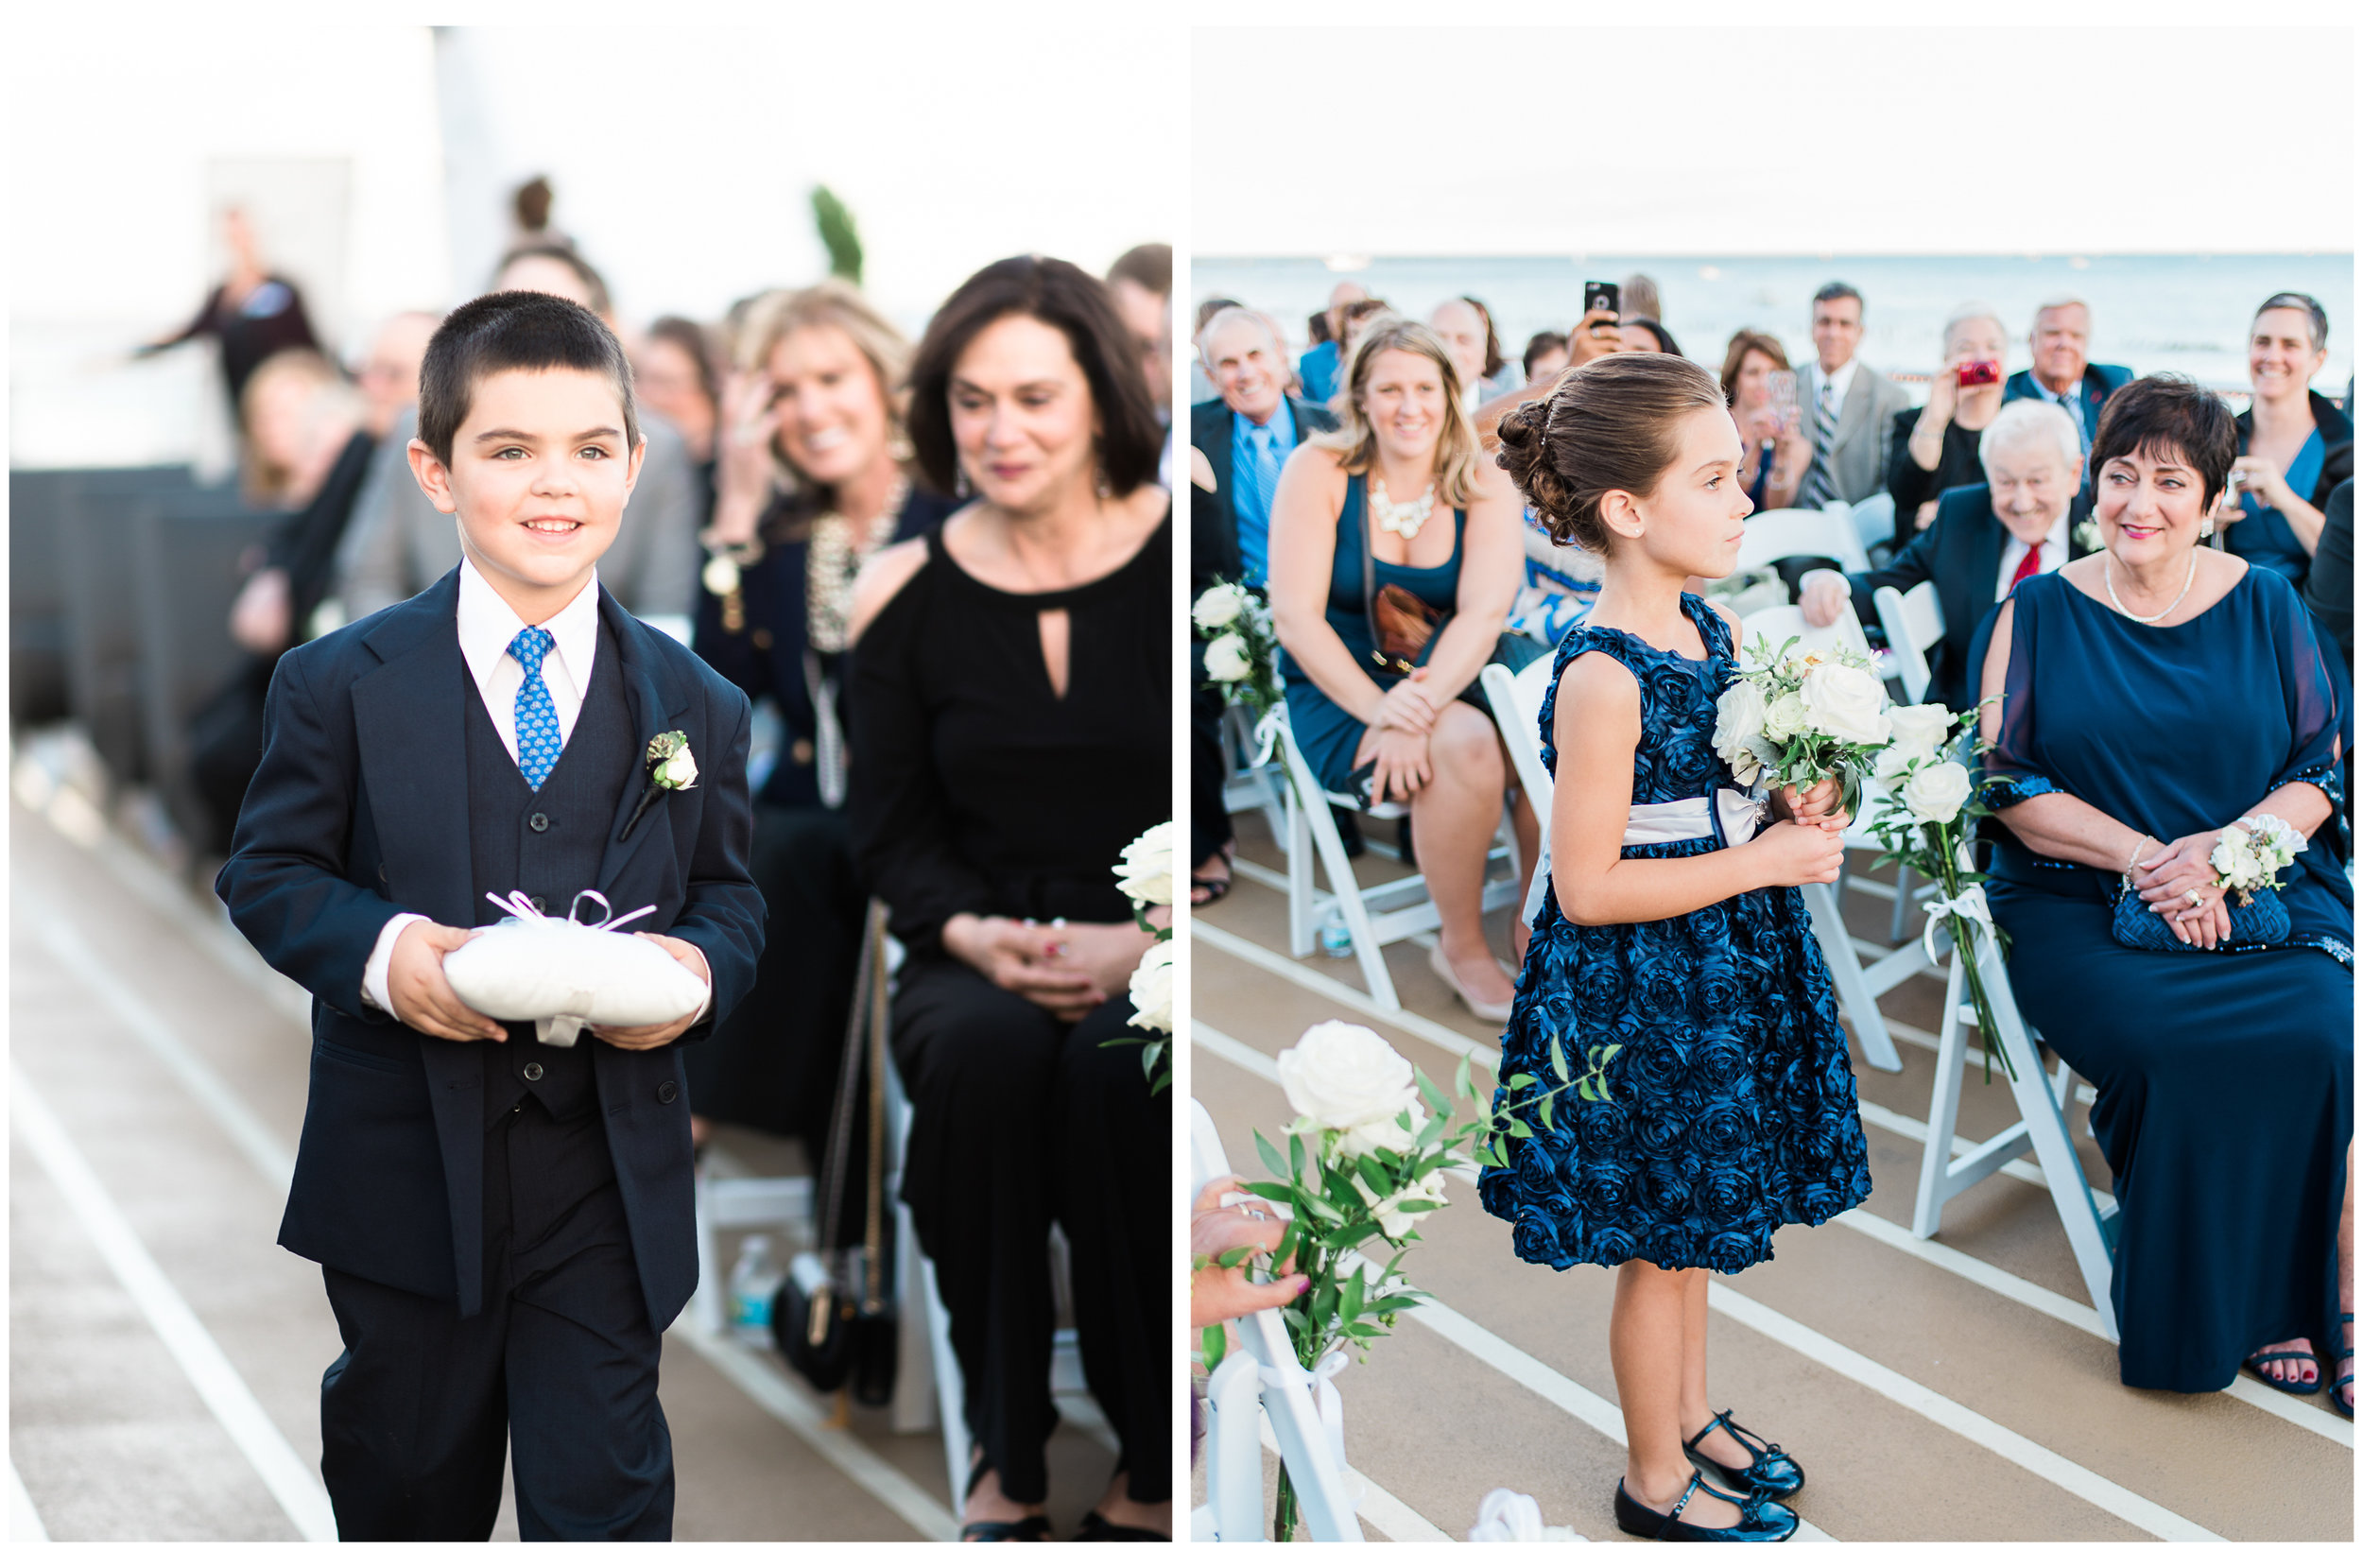 Bonphotage Chicago Wedding Photographt